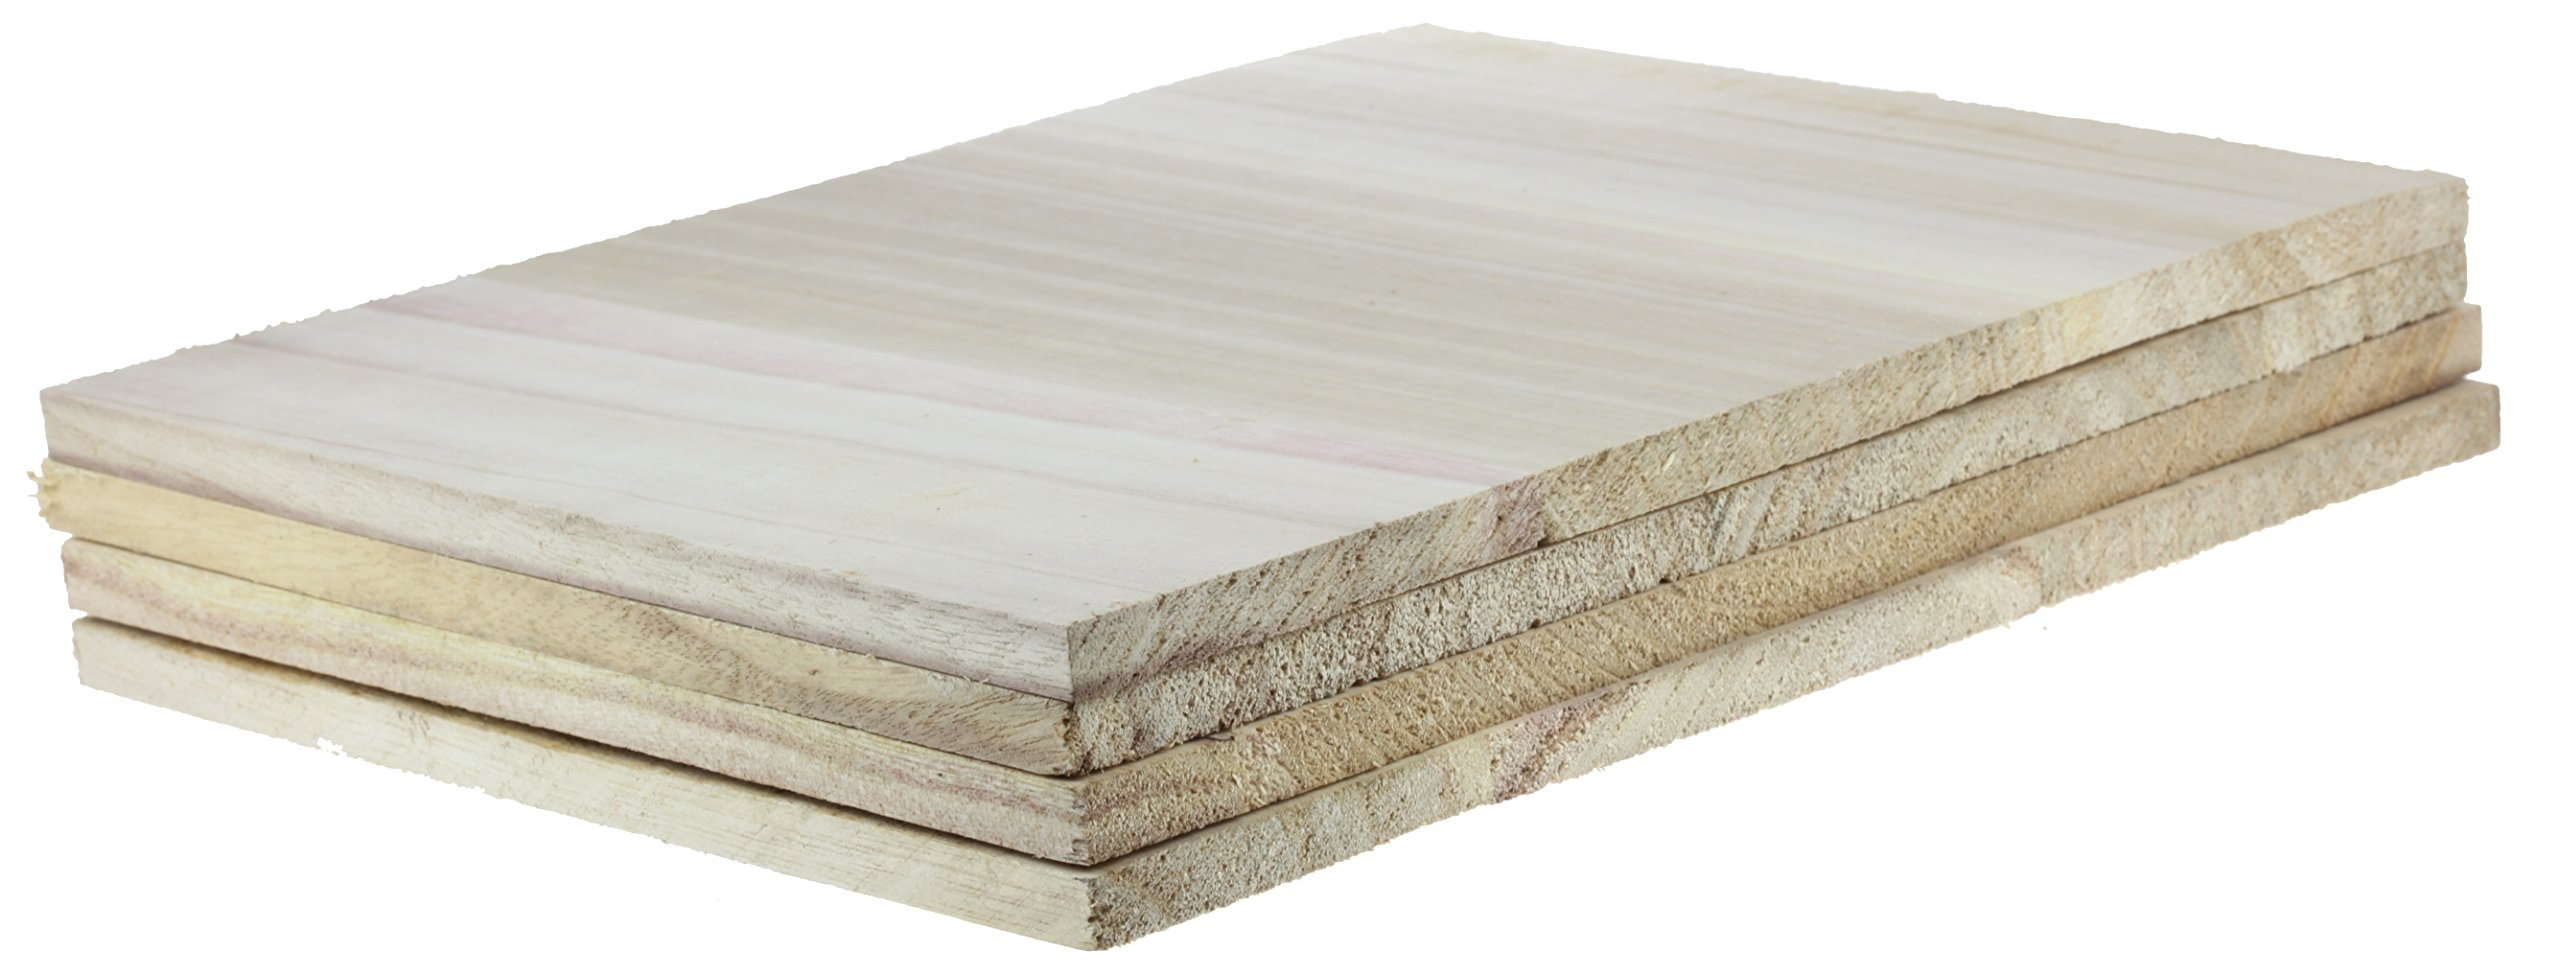 Tiger Claw Wood Breaking Board - Breakable Board in 12 mm Thickness (4 Board Pack)